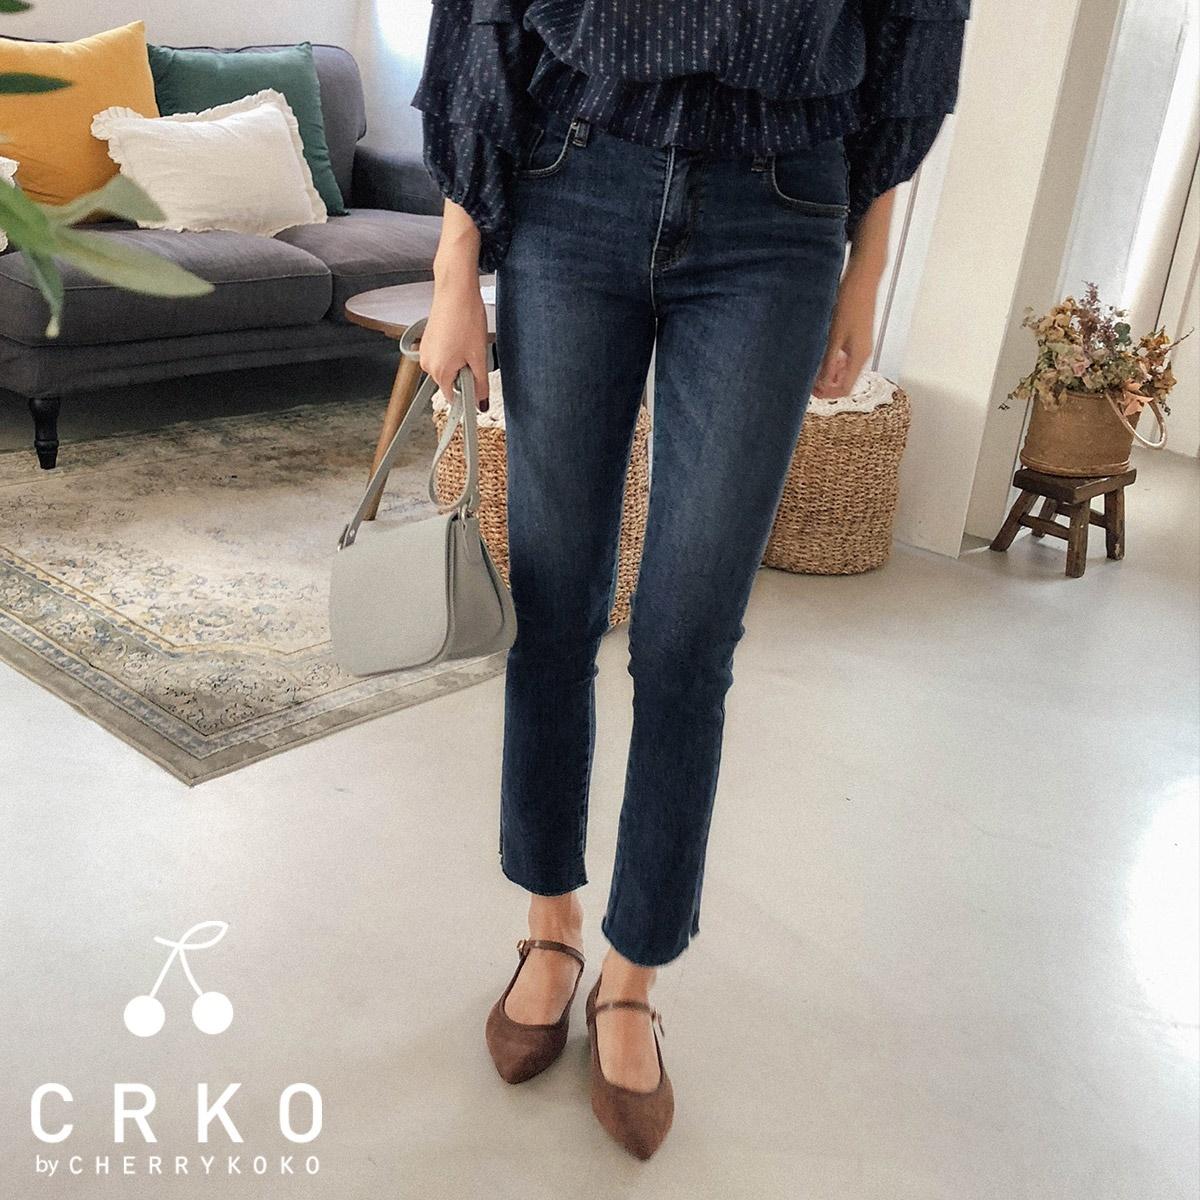 [CHERRYKOKO官方旗艦店] 丹寧長褲 / secreto jeans